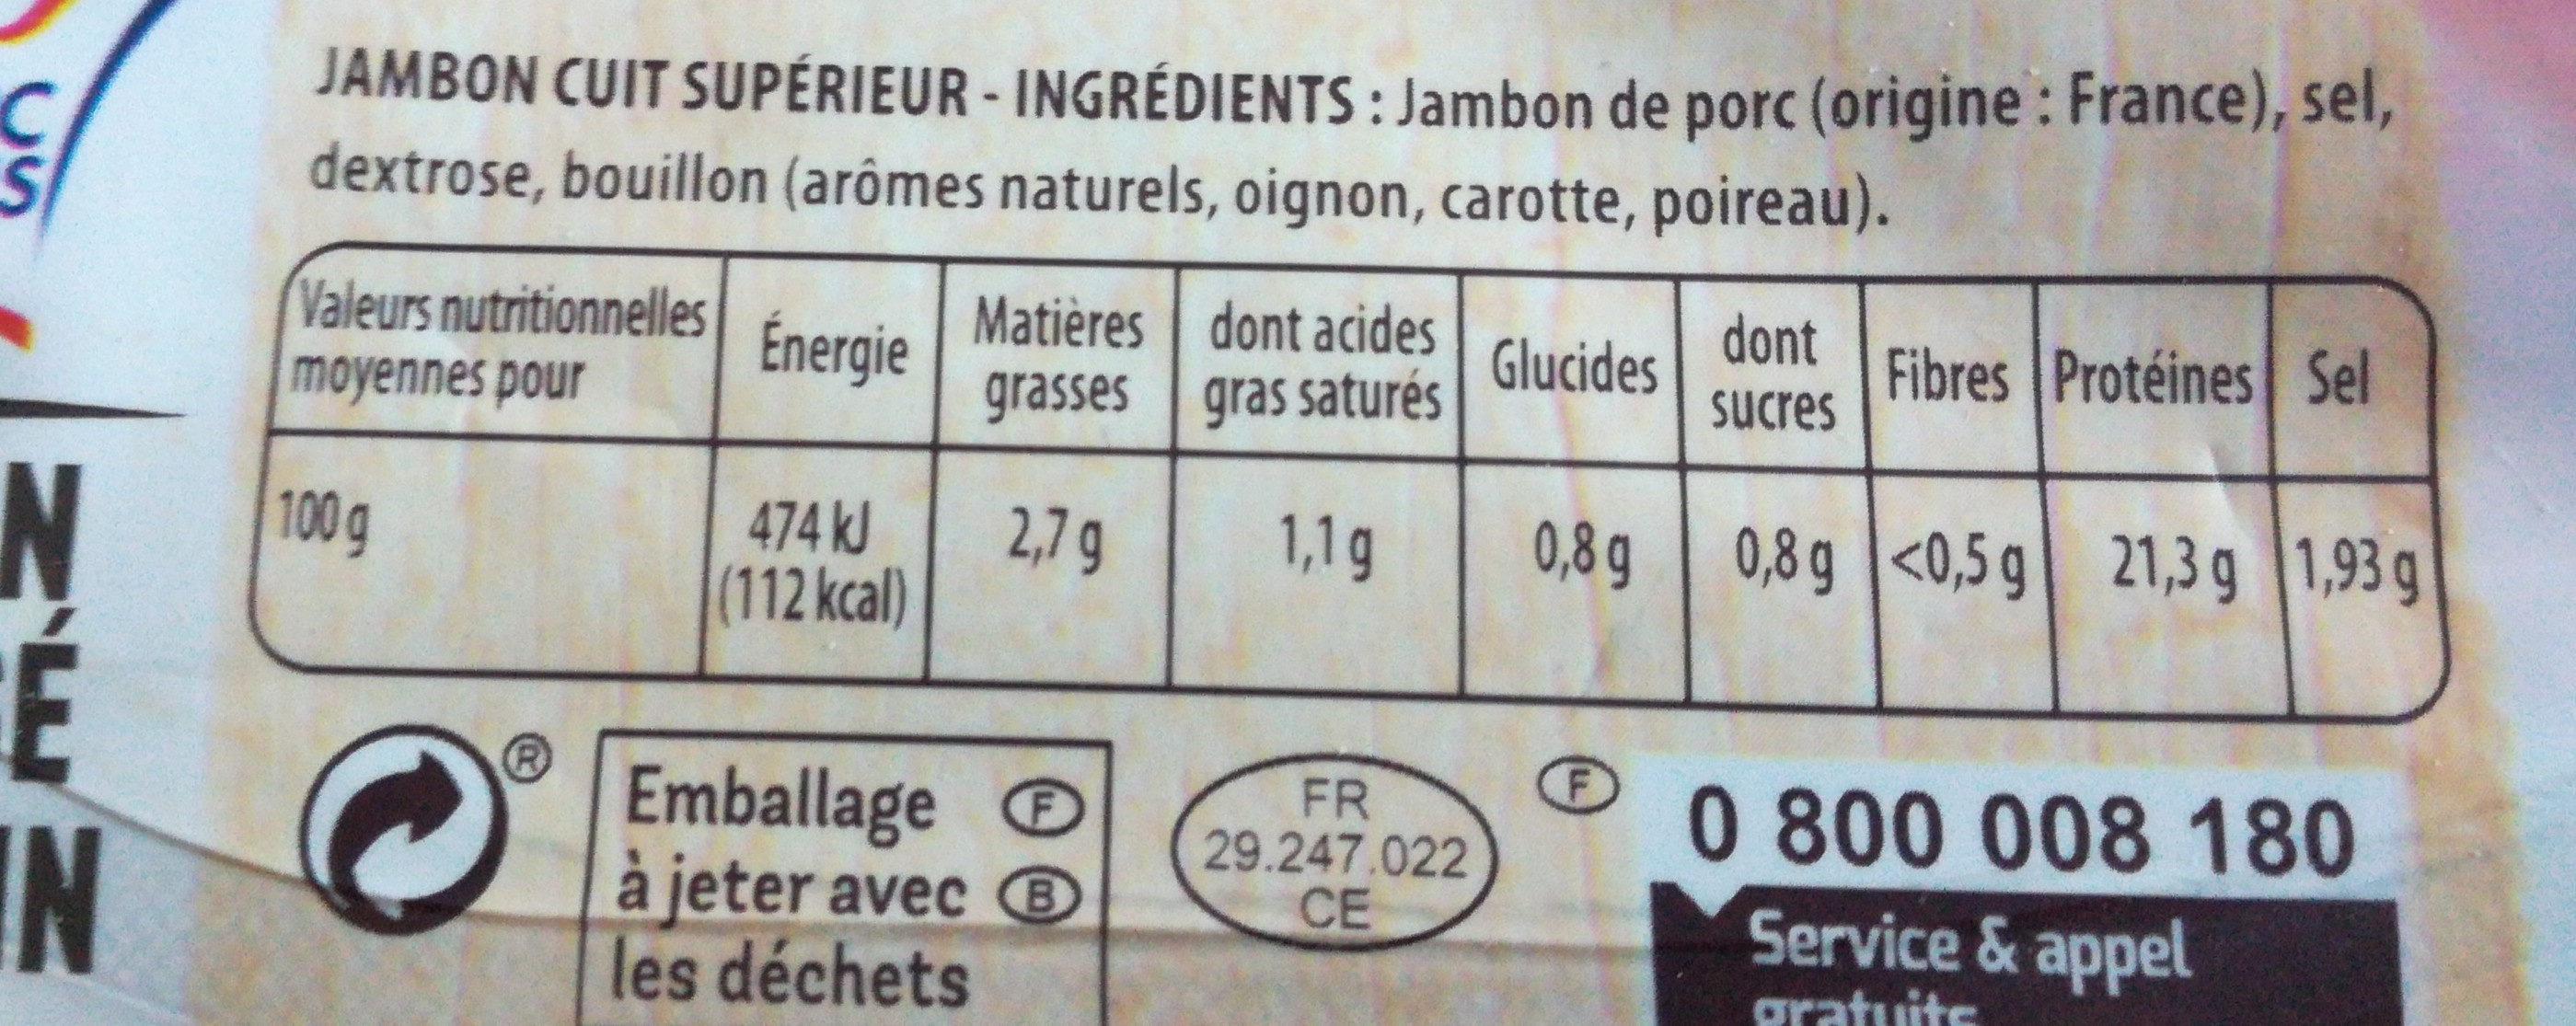 Jambon Le Tradition sans nitrite - Nutrition facts - fr